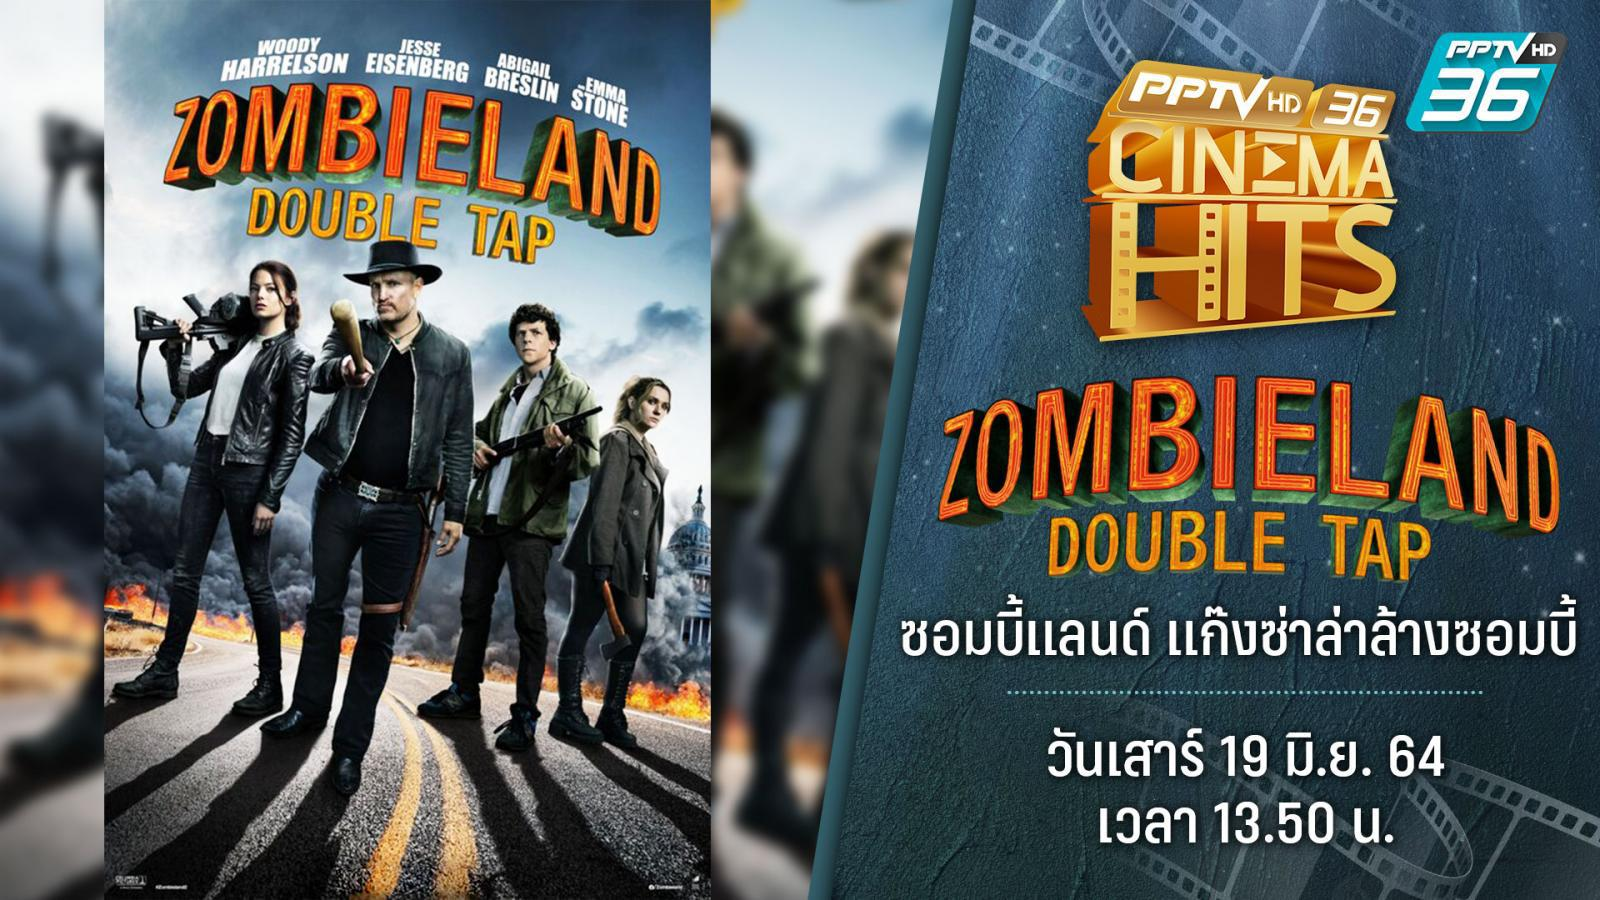 Zombieland: Double Tap ซอมบี้แลนด์ แก๊งซ่าล่าล้างซอมบี้